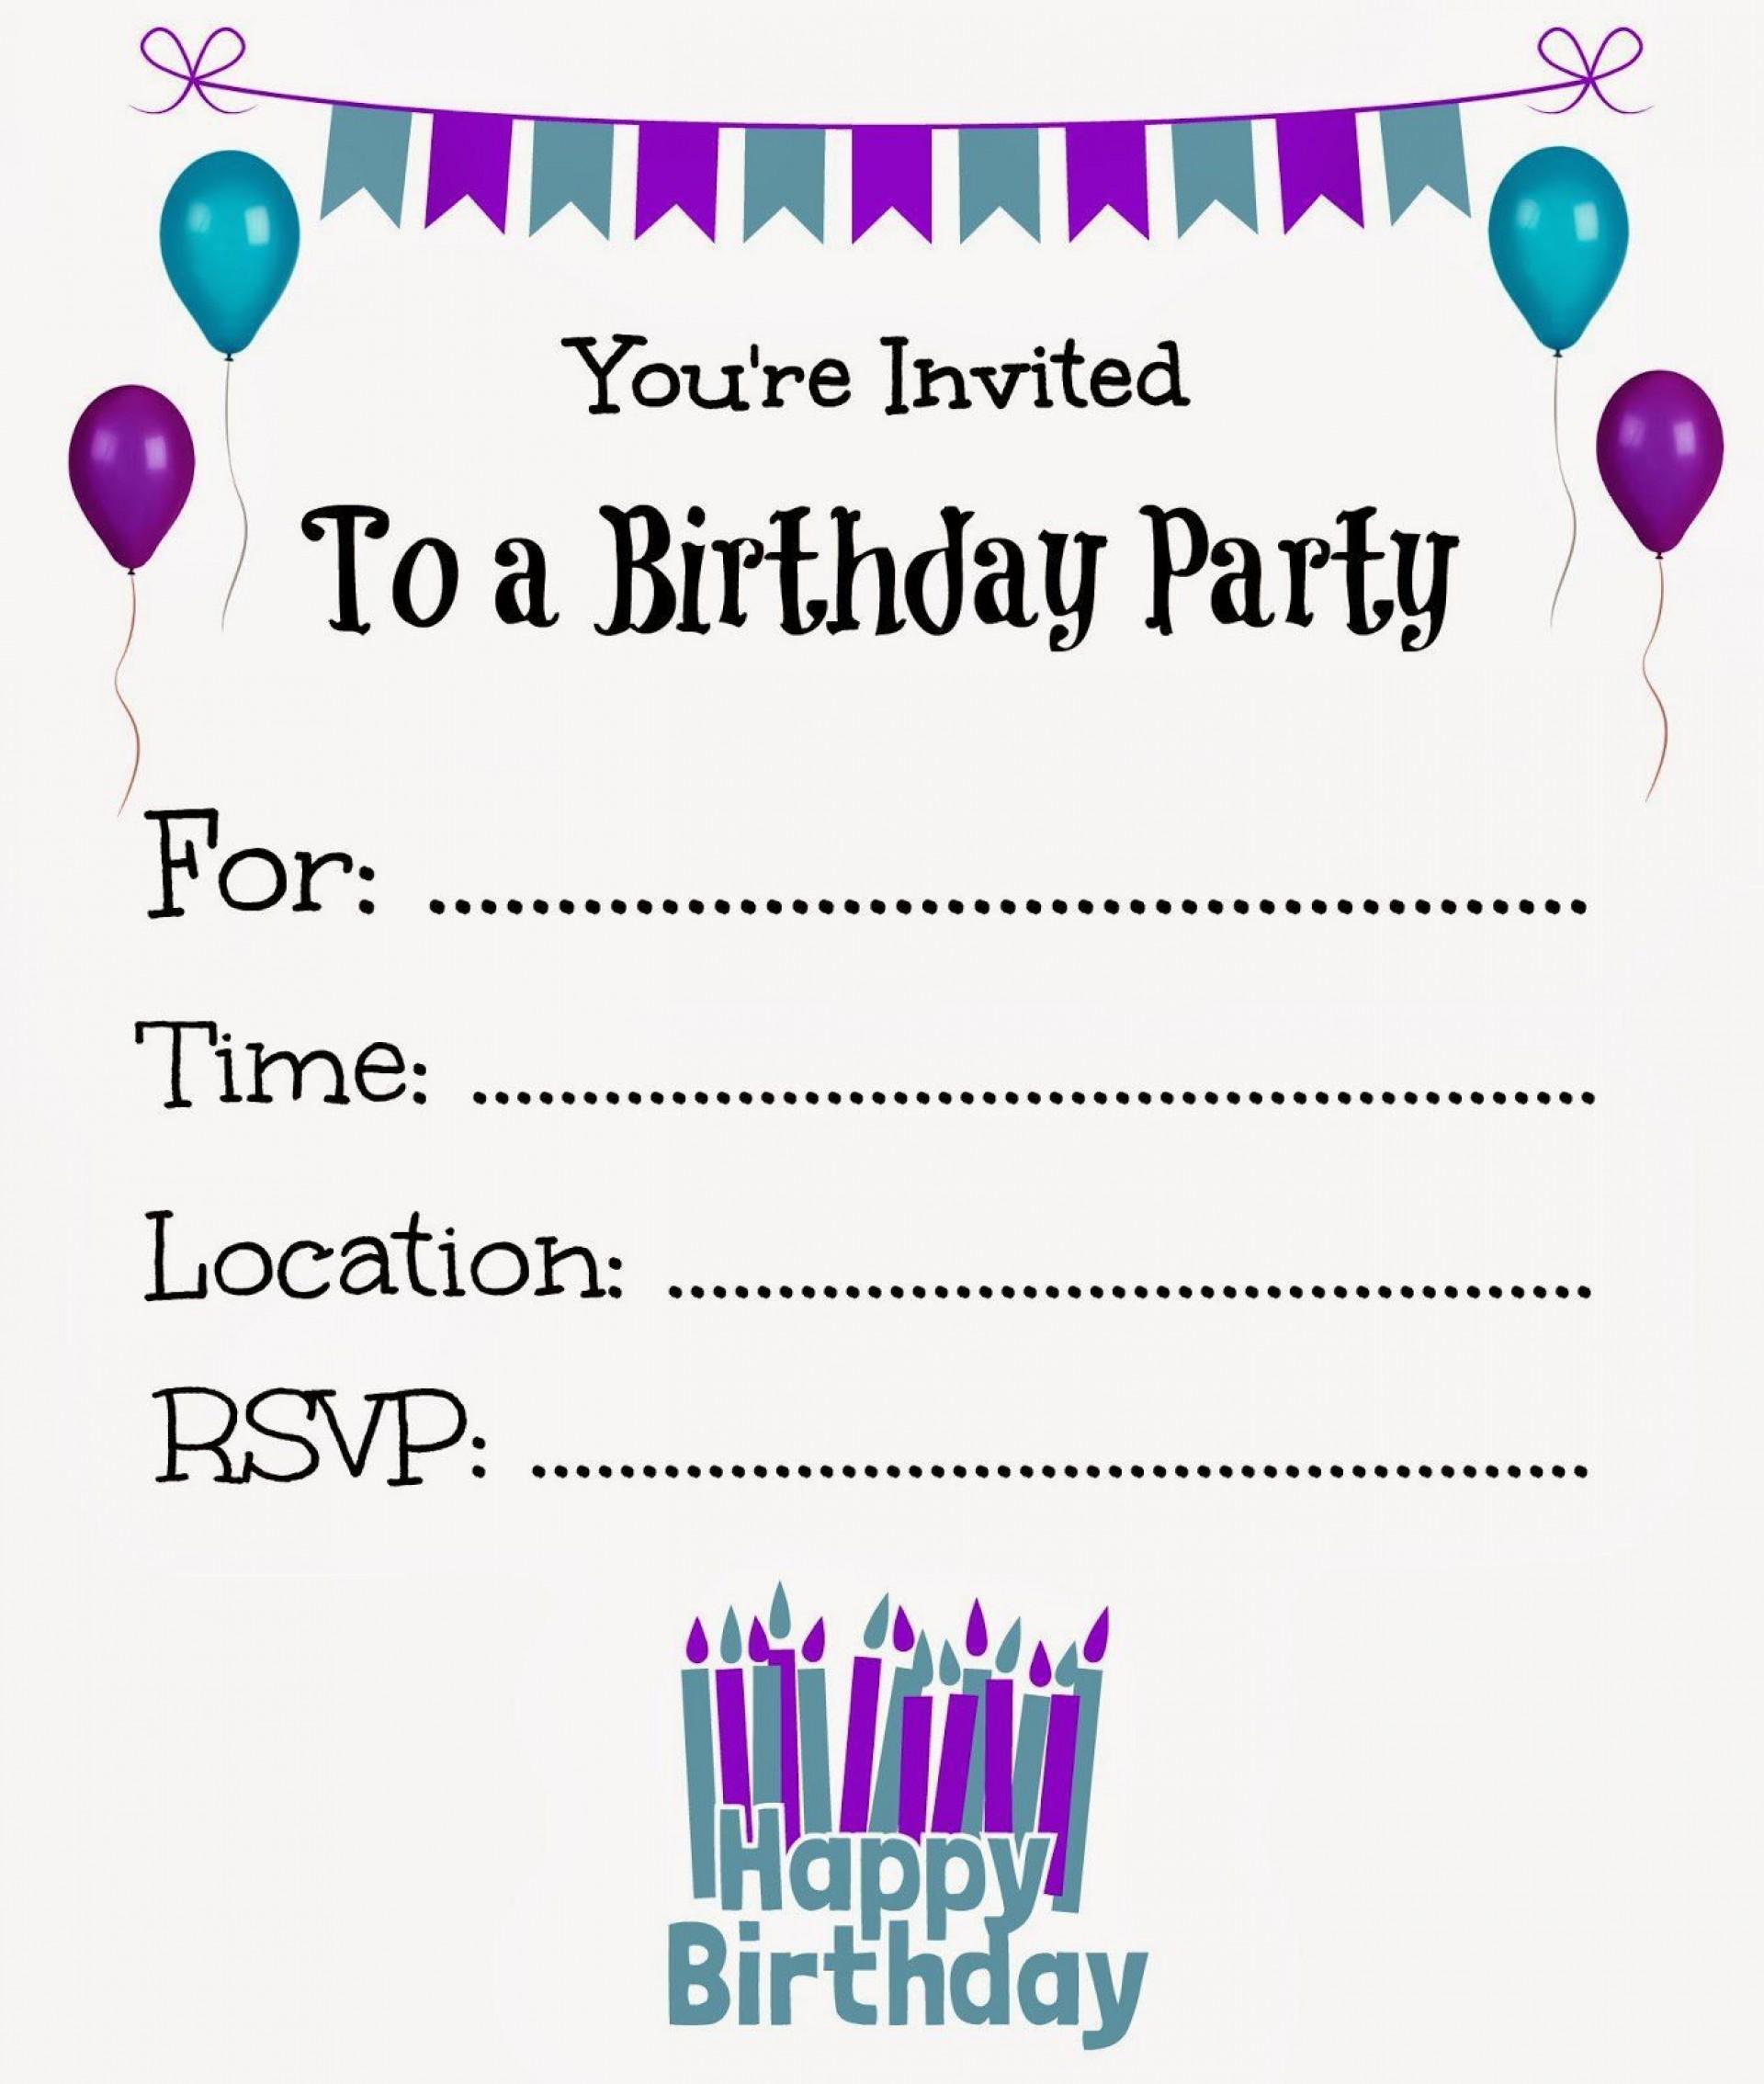 008 Unique Free Online Birthday Party Invitation Template Photo  Templates Maker1920